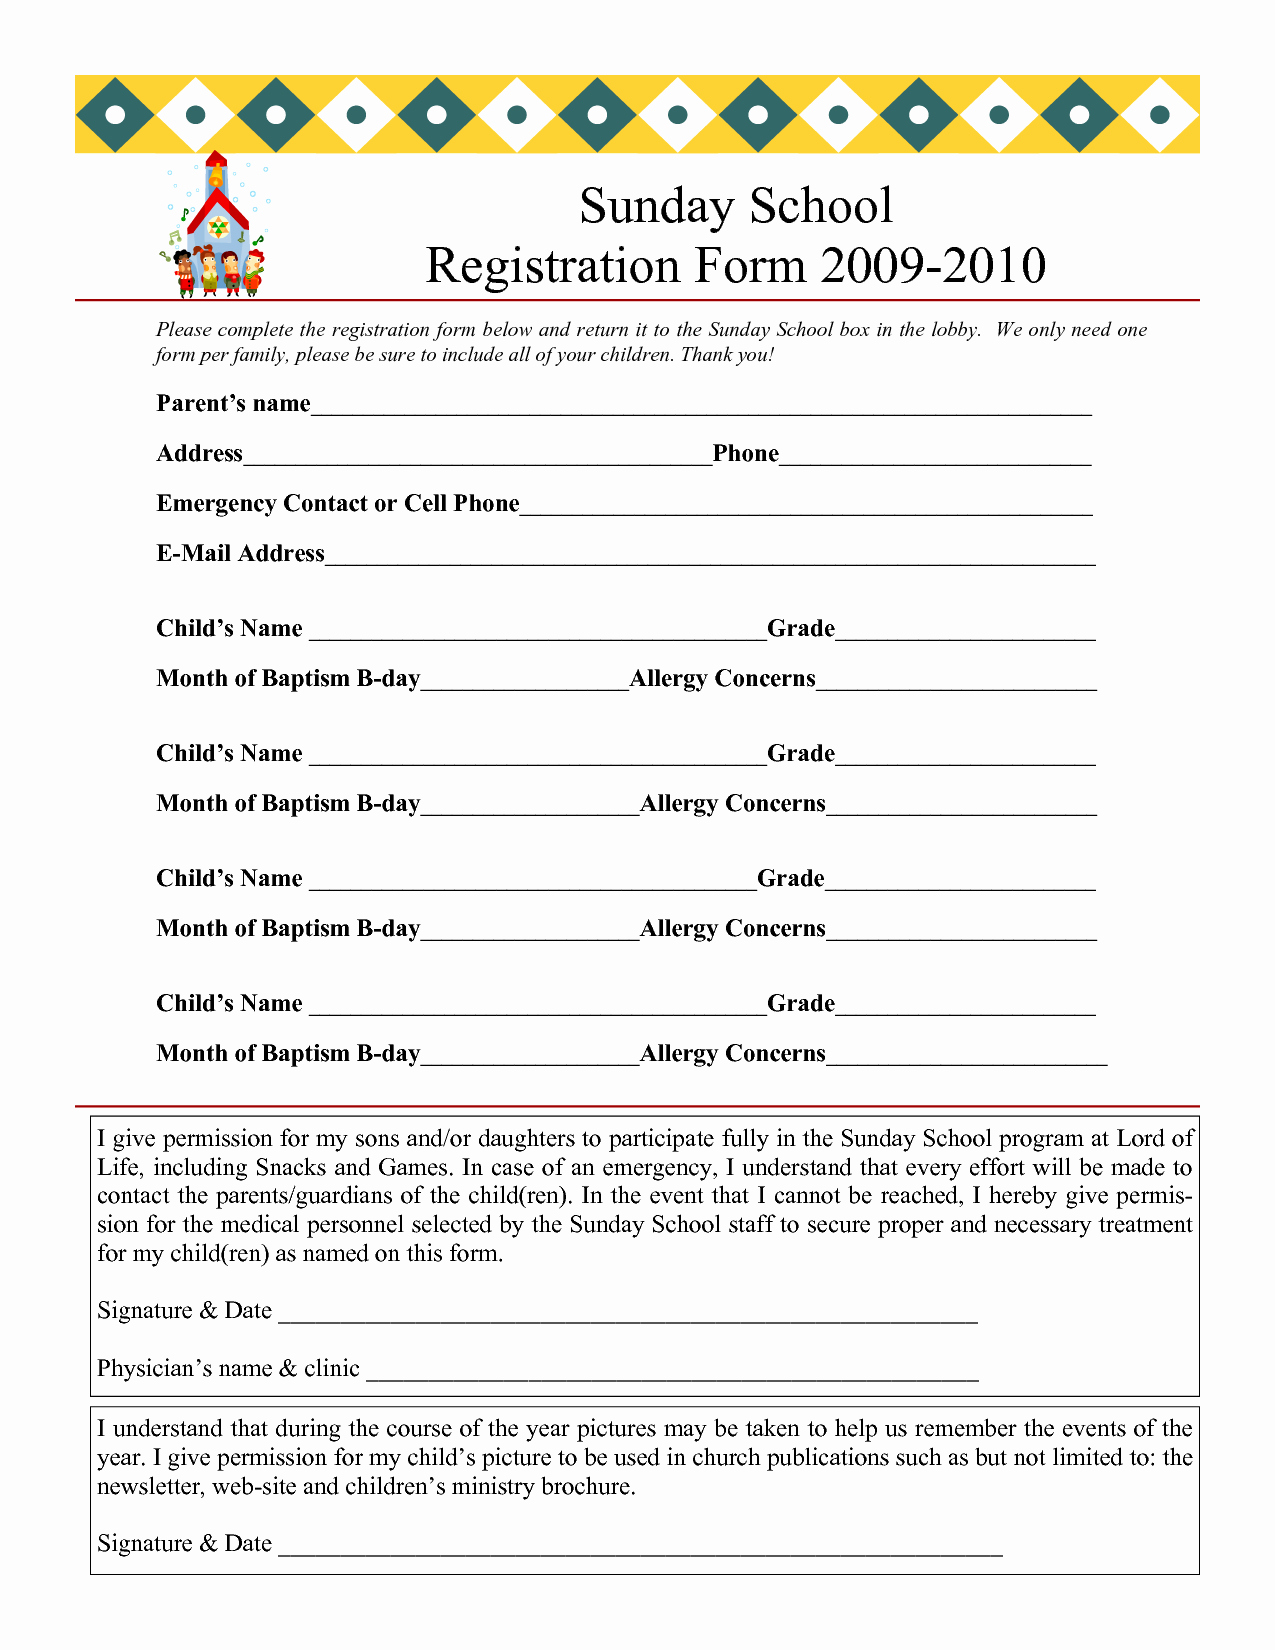 School Registration form Template Elegant Sunday School Registration form 2009 2010